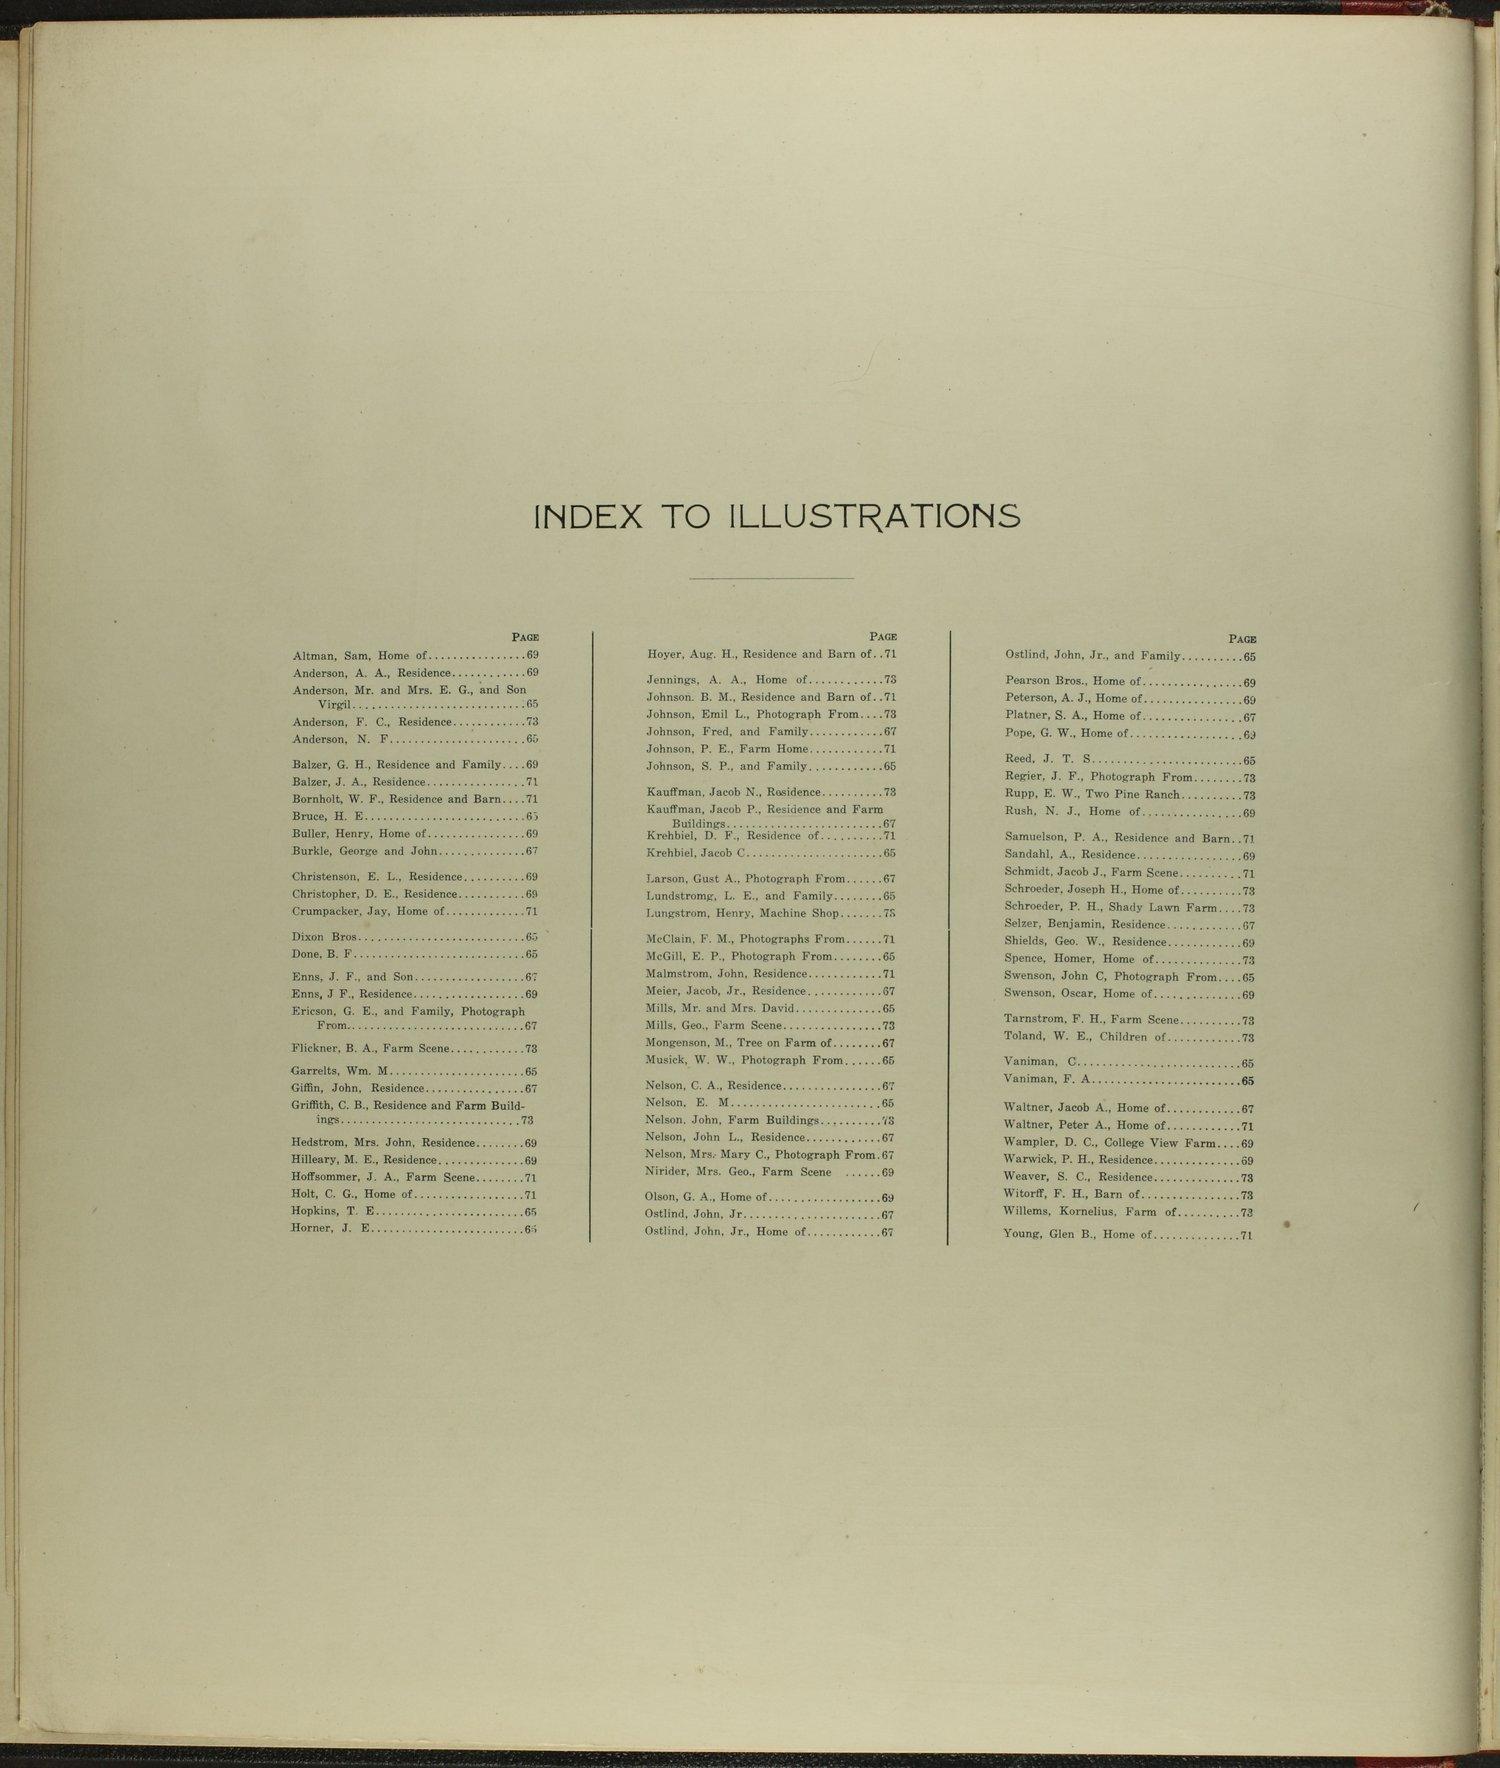 Standard atlas of McPherson County, Kansas - Index to Illustrations